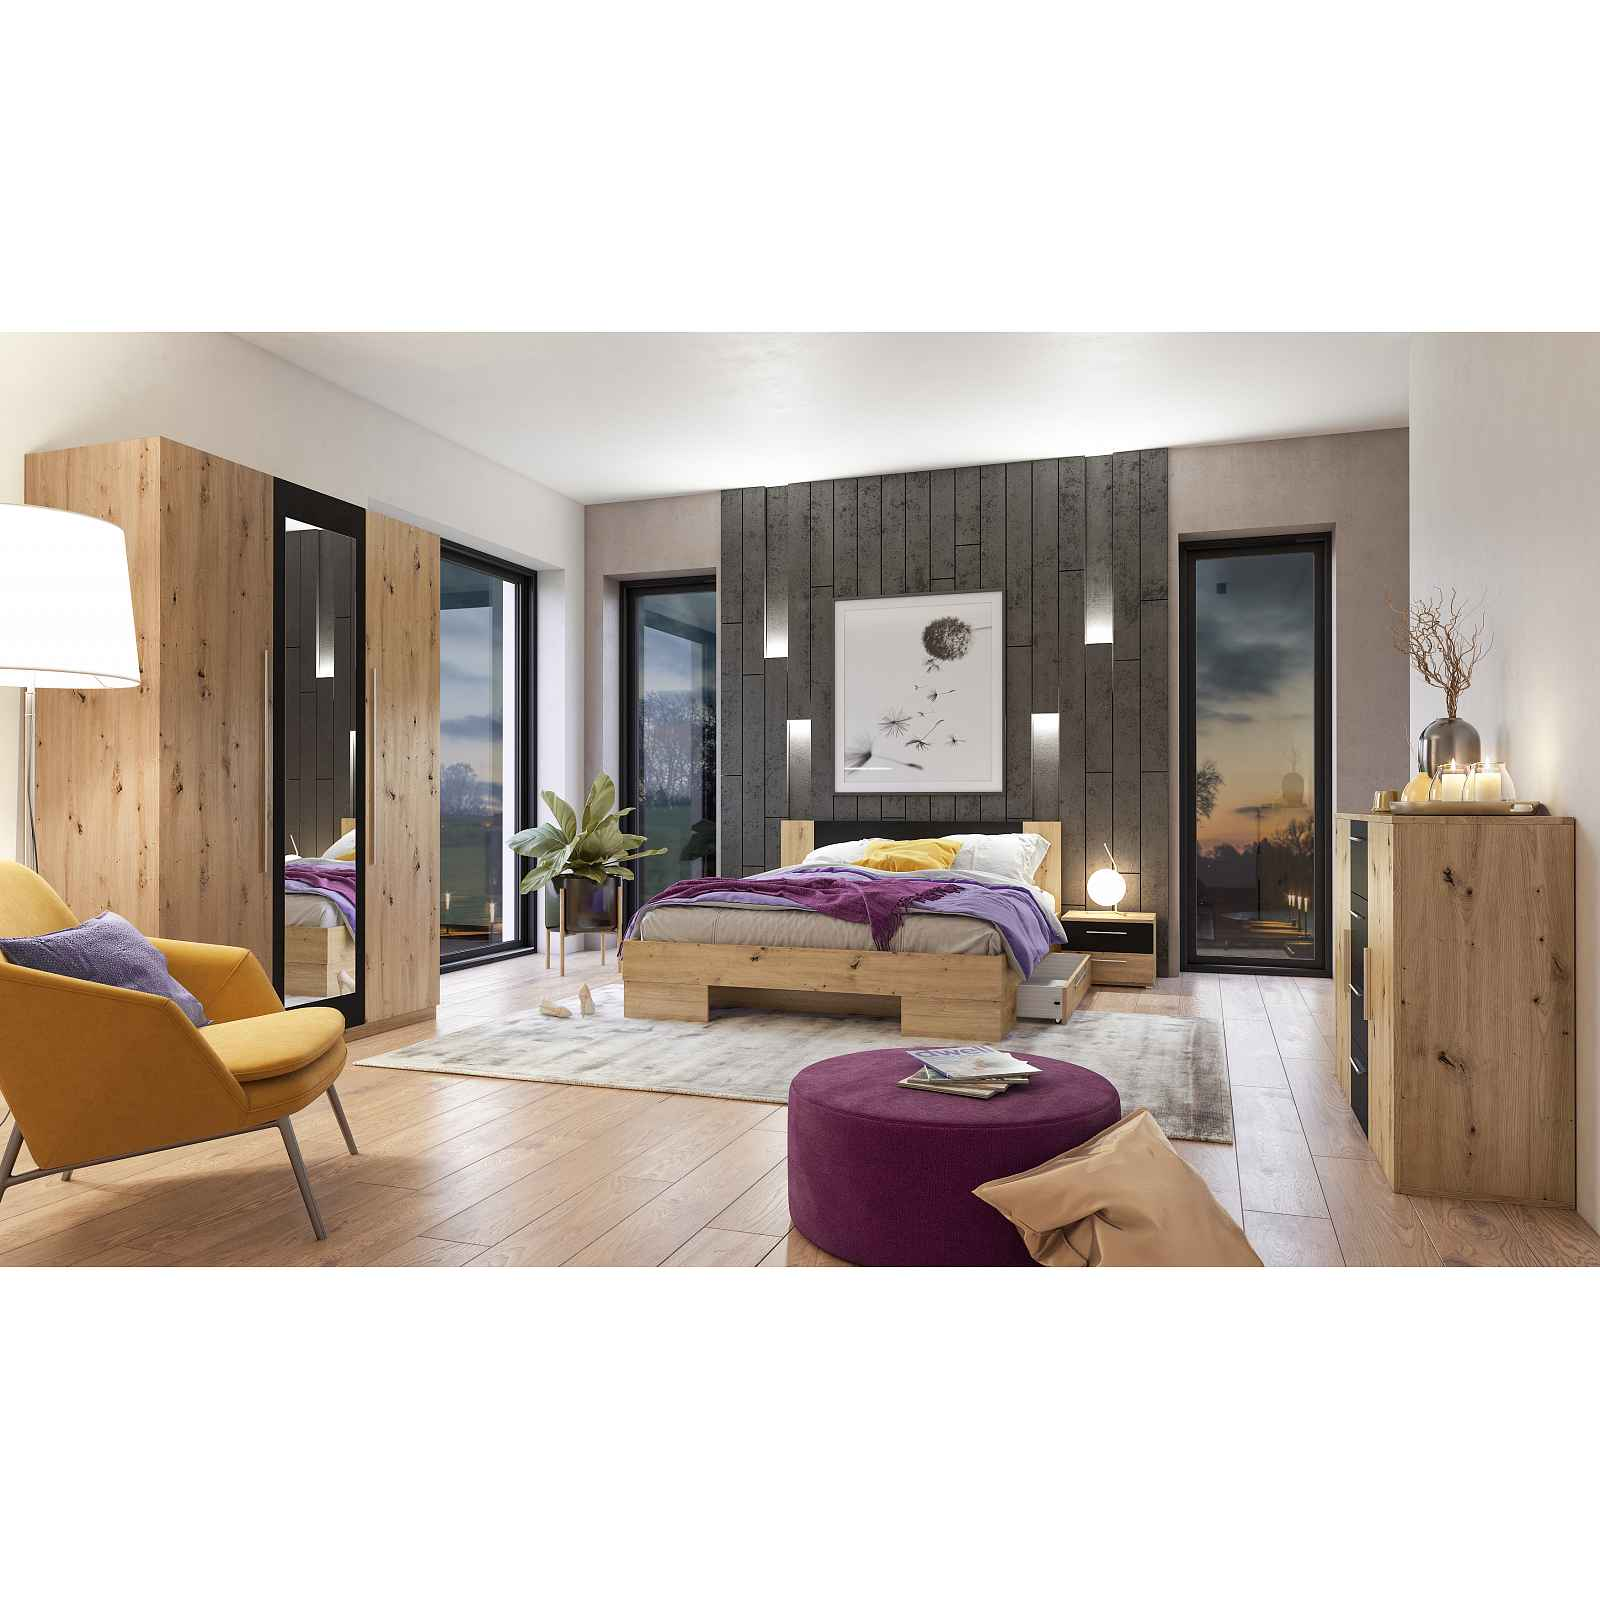 VERA II ložnice s postelí 160x200 cm, dub artisan/černá